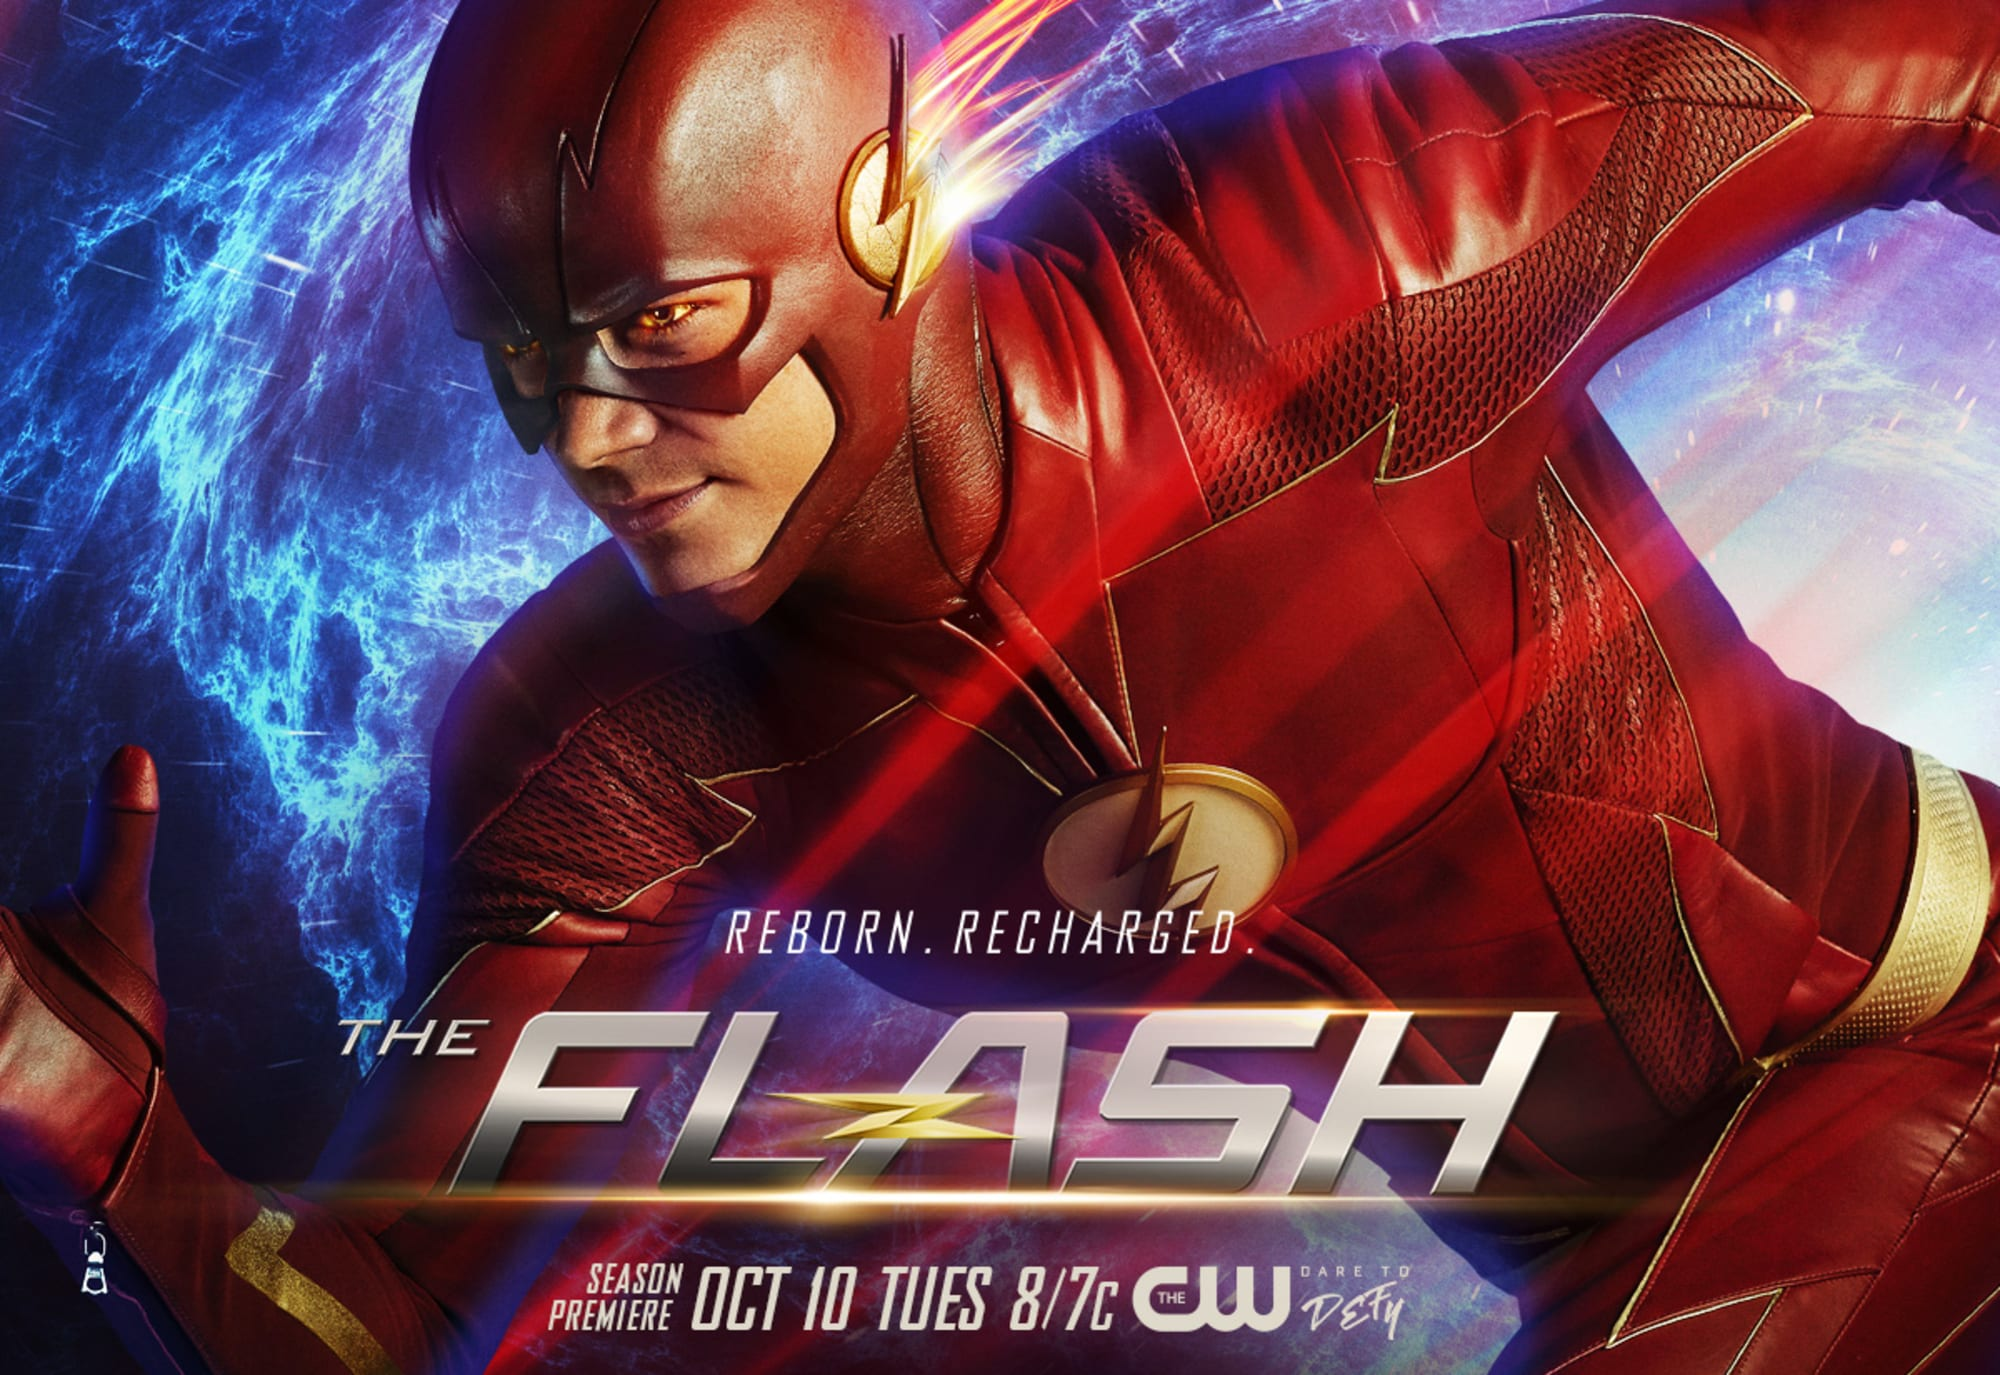 The Flash Season 4 Episode 13 Recap And Review True Colors